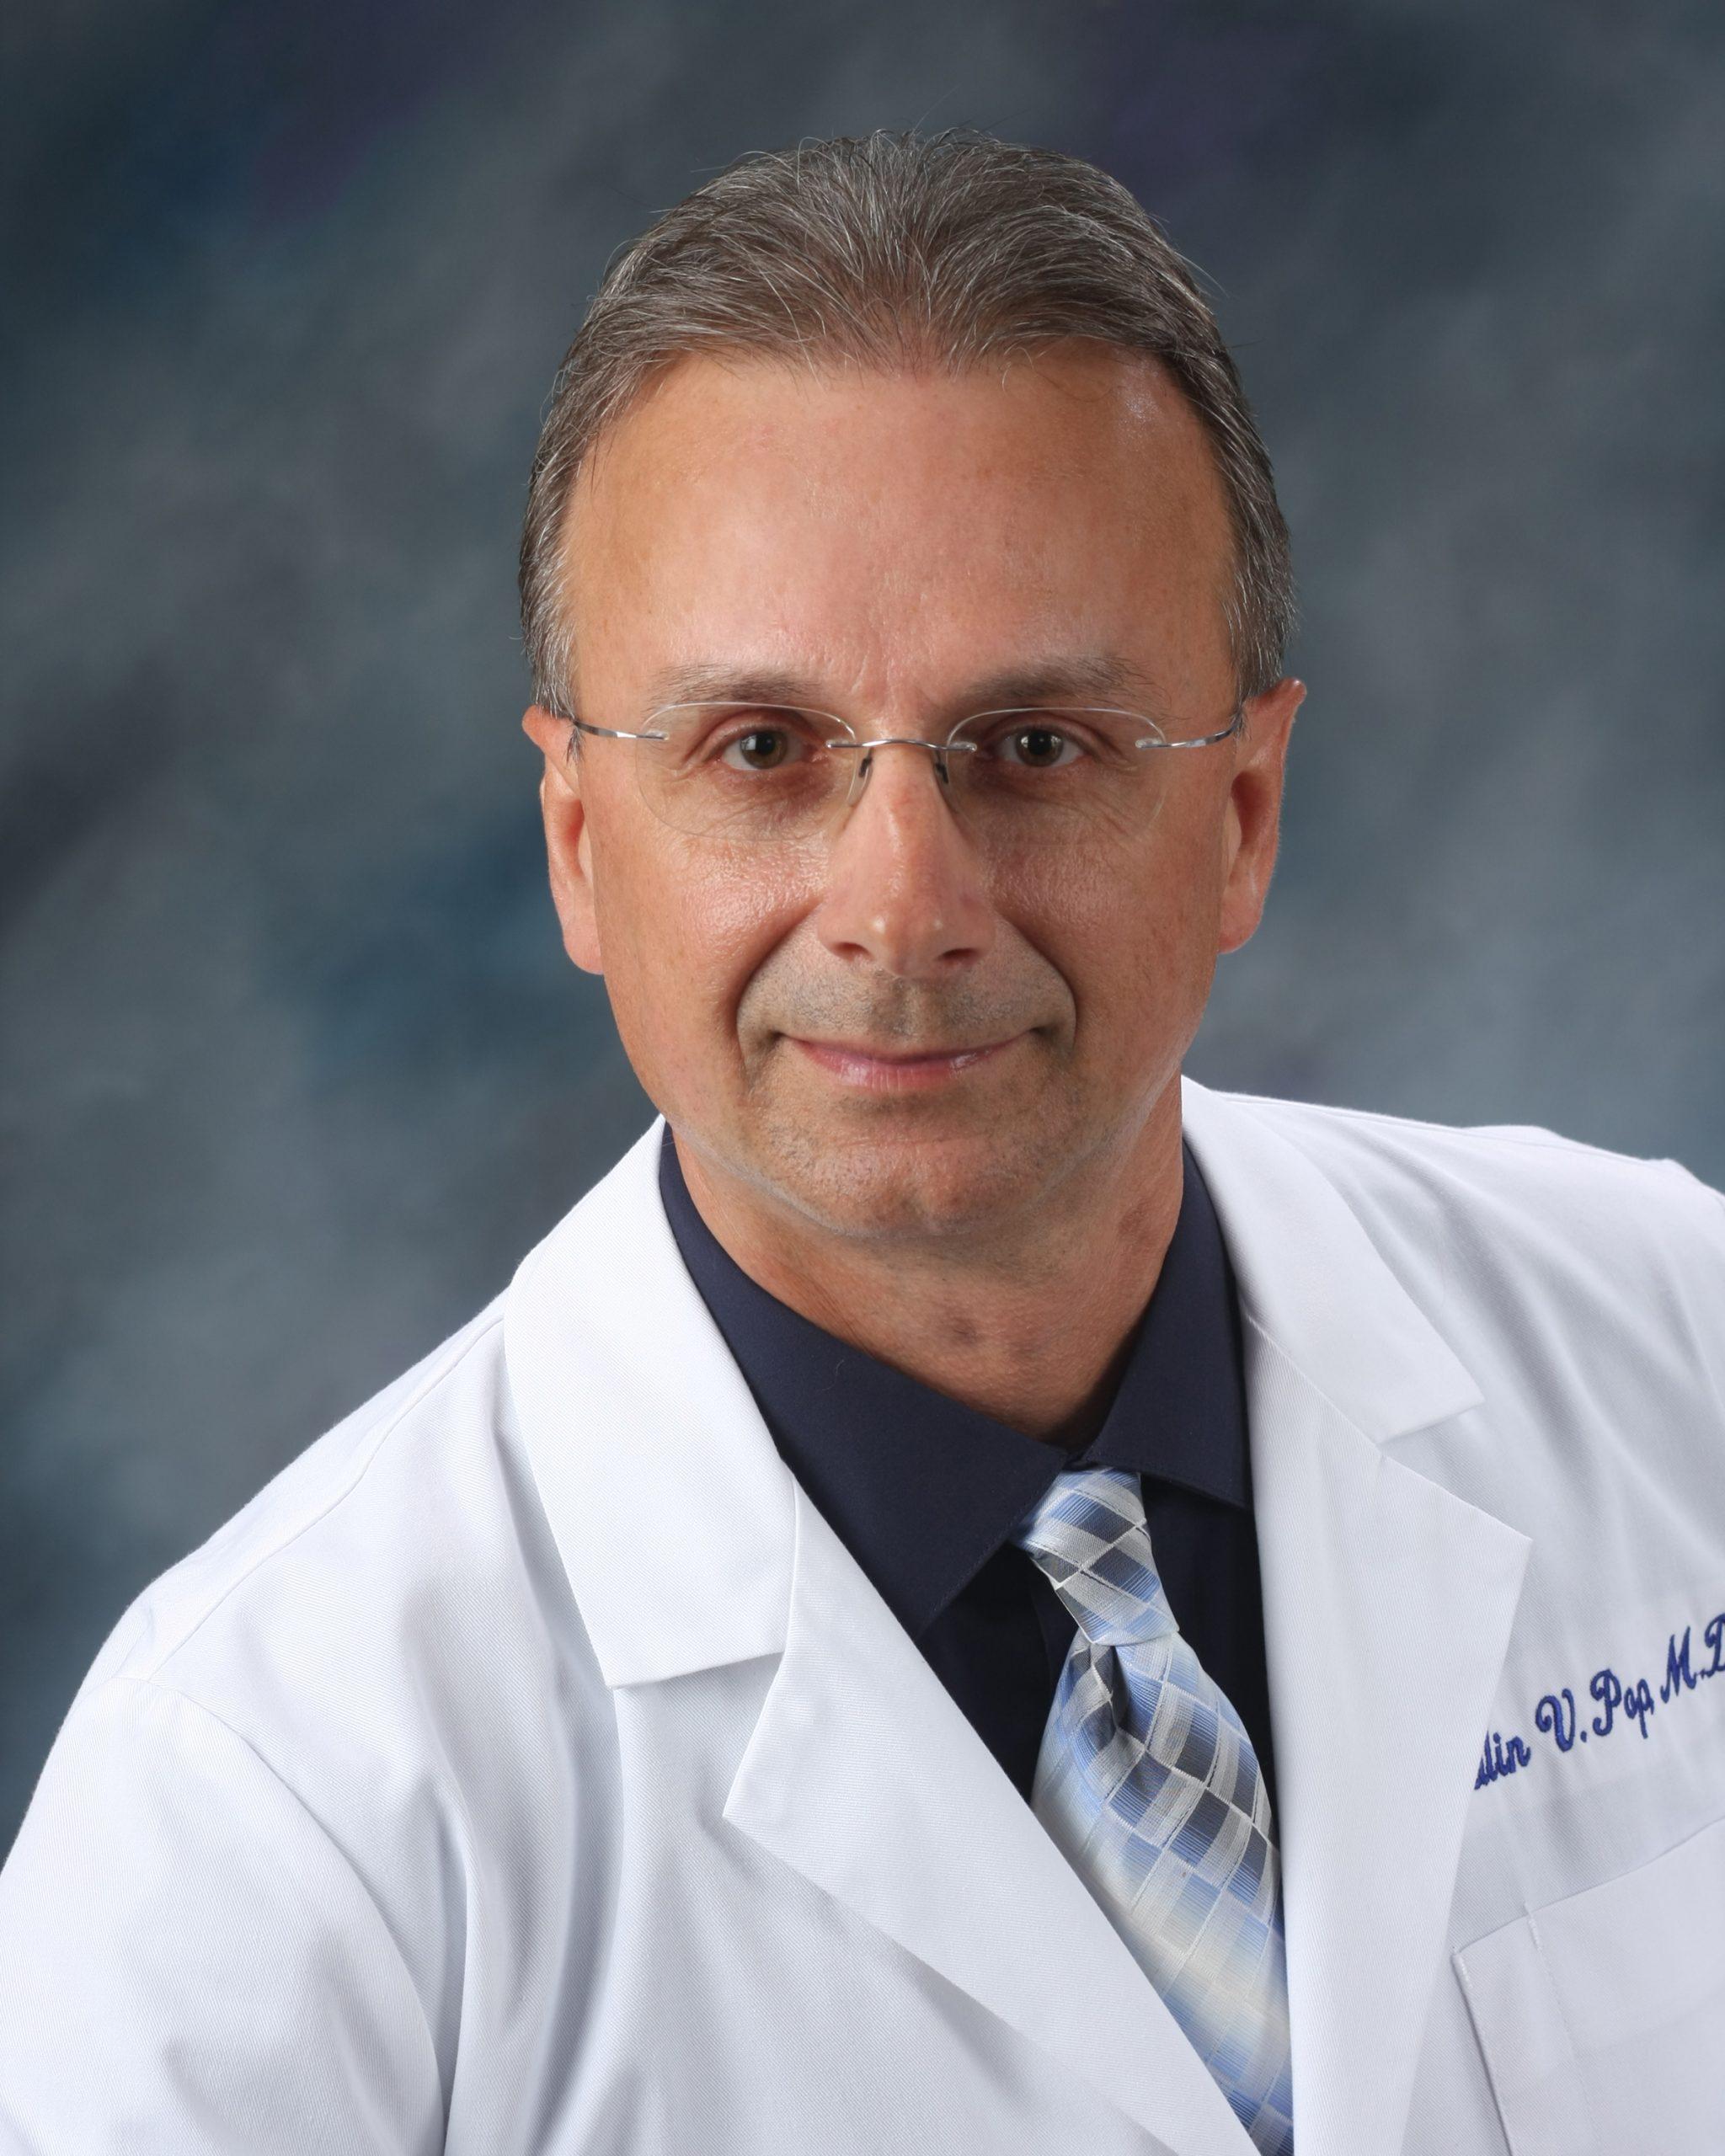 dr pop md medicine diabetes 344